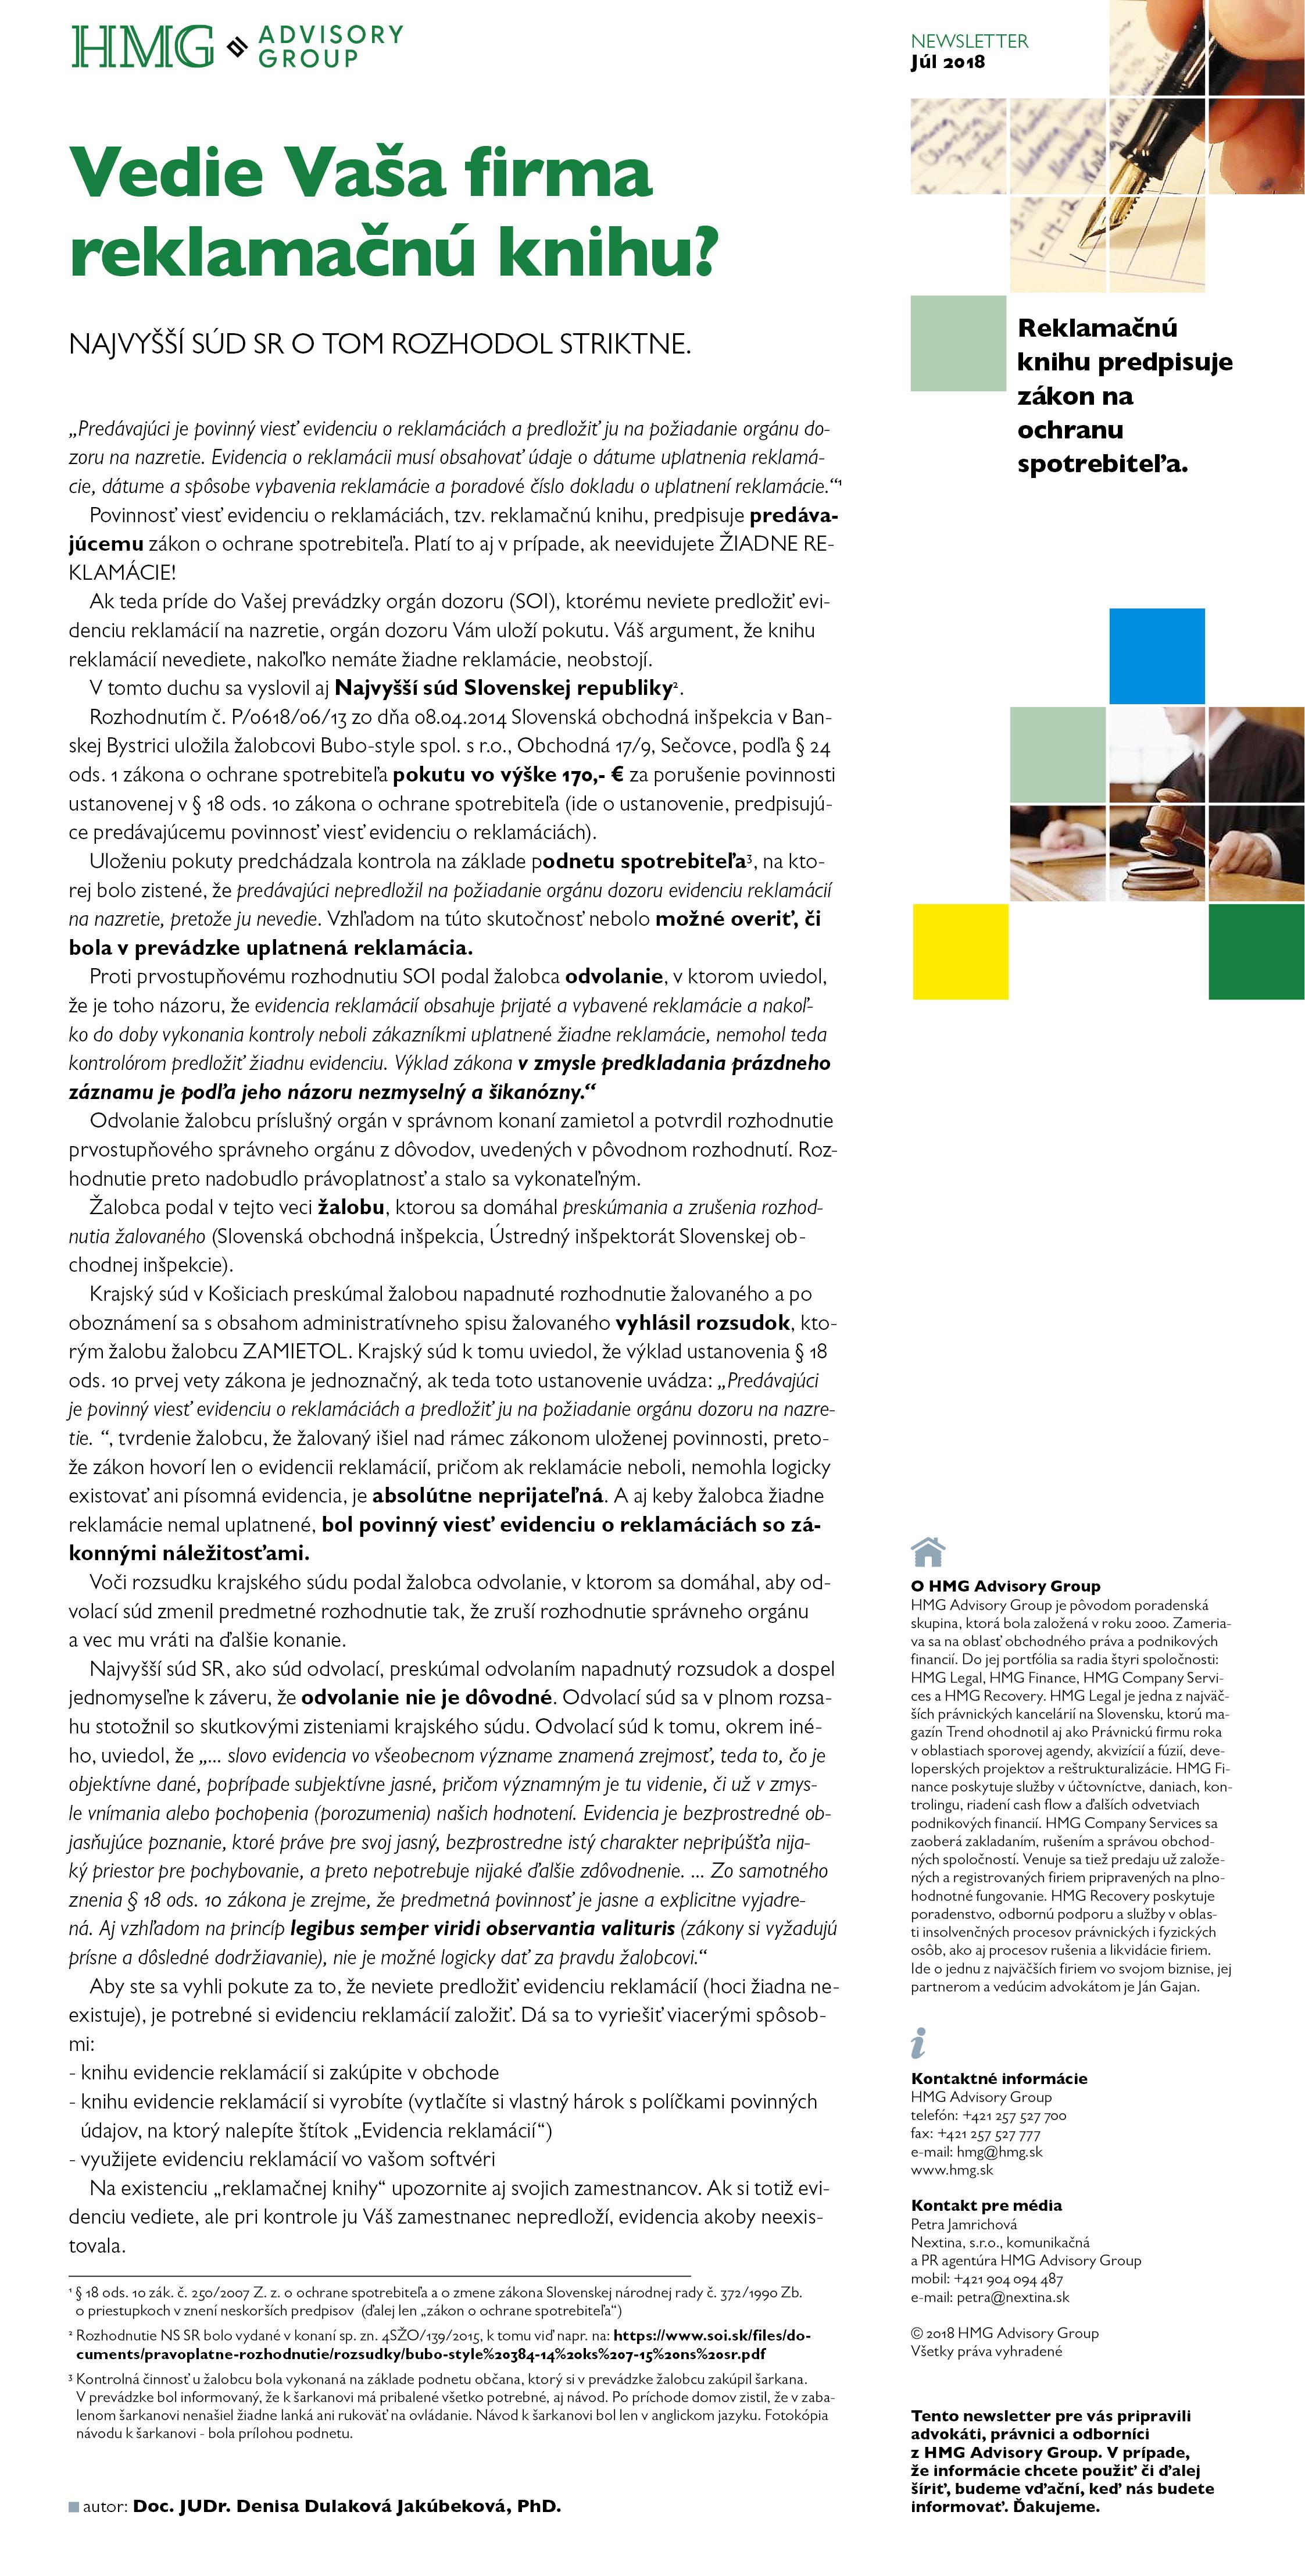 HMG_newsletter_reklamacna kniha1.jpg